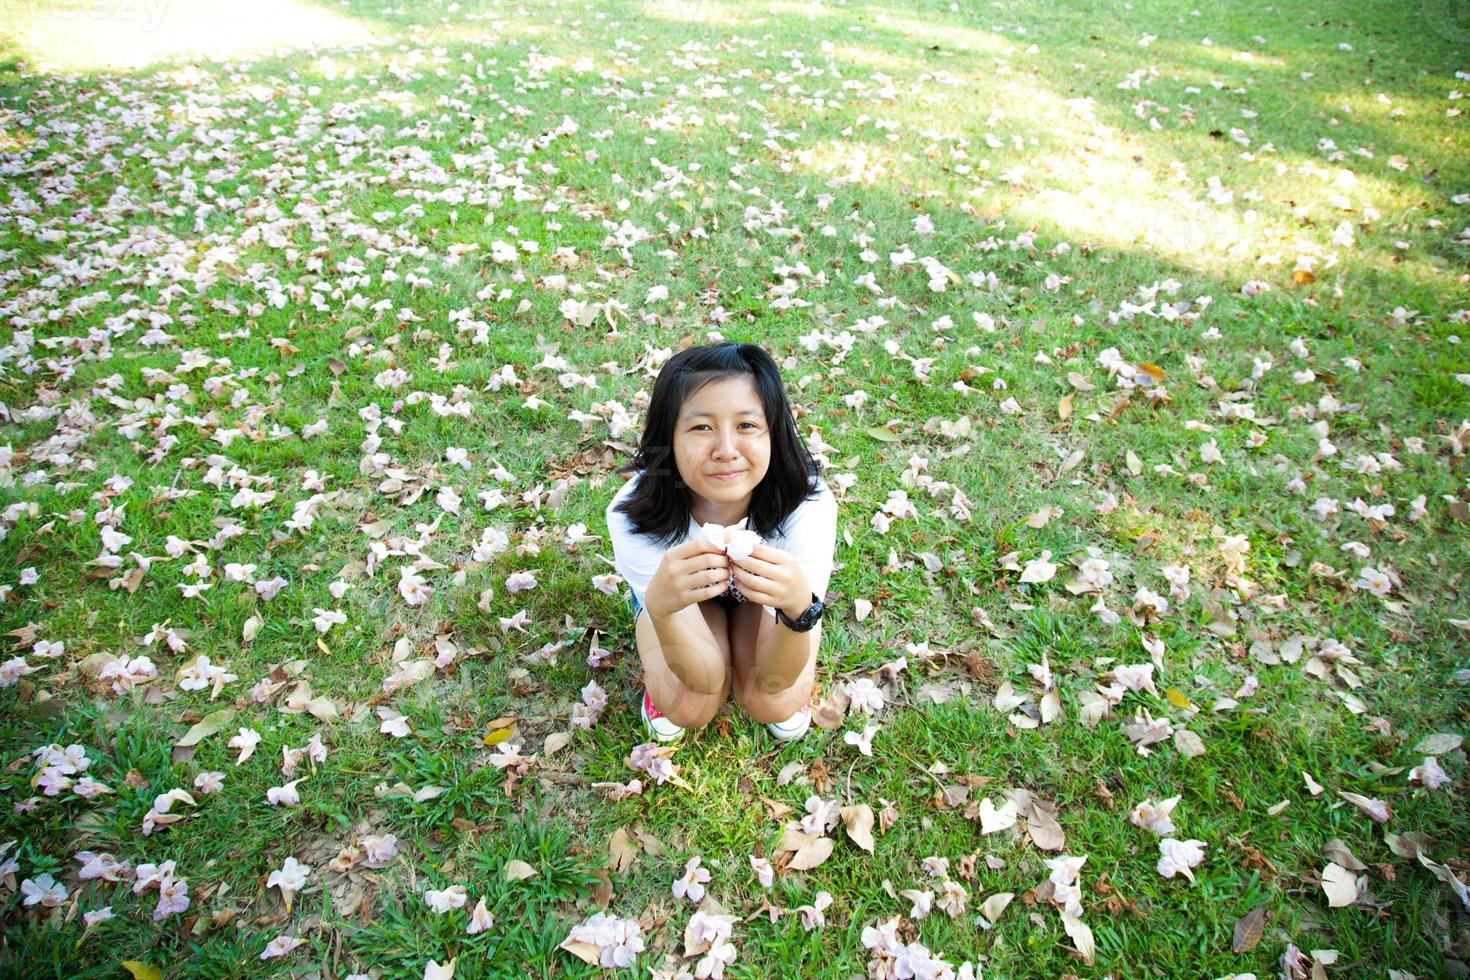 adolescente sentado na grama foto